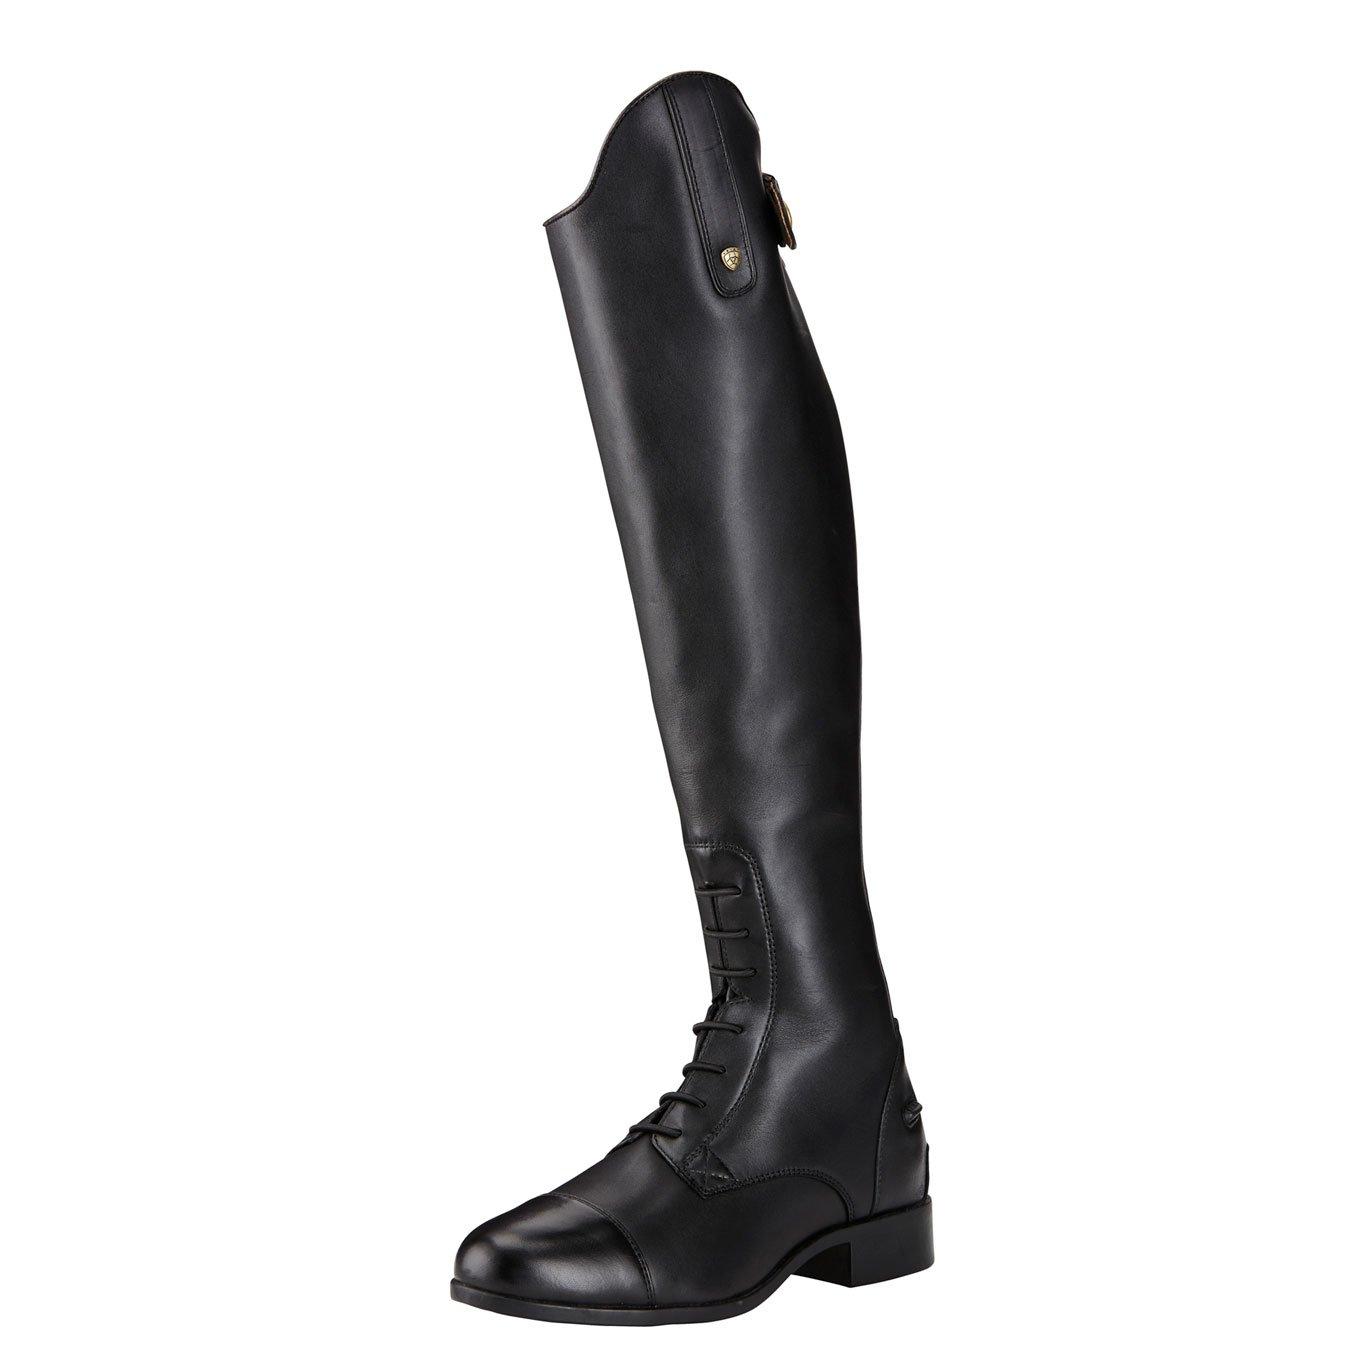 Ariat Heritage IIフィールドZip Contour IIフィールドZip Boot B0727NHR6W B0727NHR6W 8.5 Slim Boot/Med, MamoQQ アジアンインテリア:524170c2 --- harrow-unison.org.uk